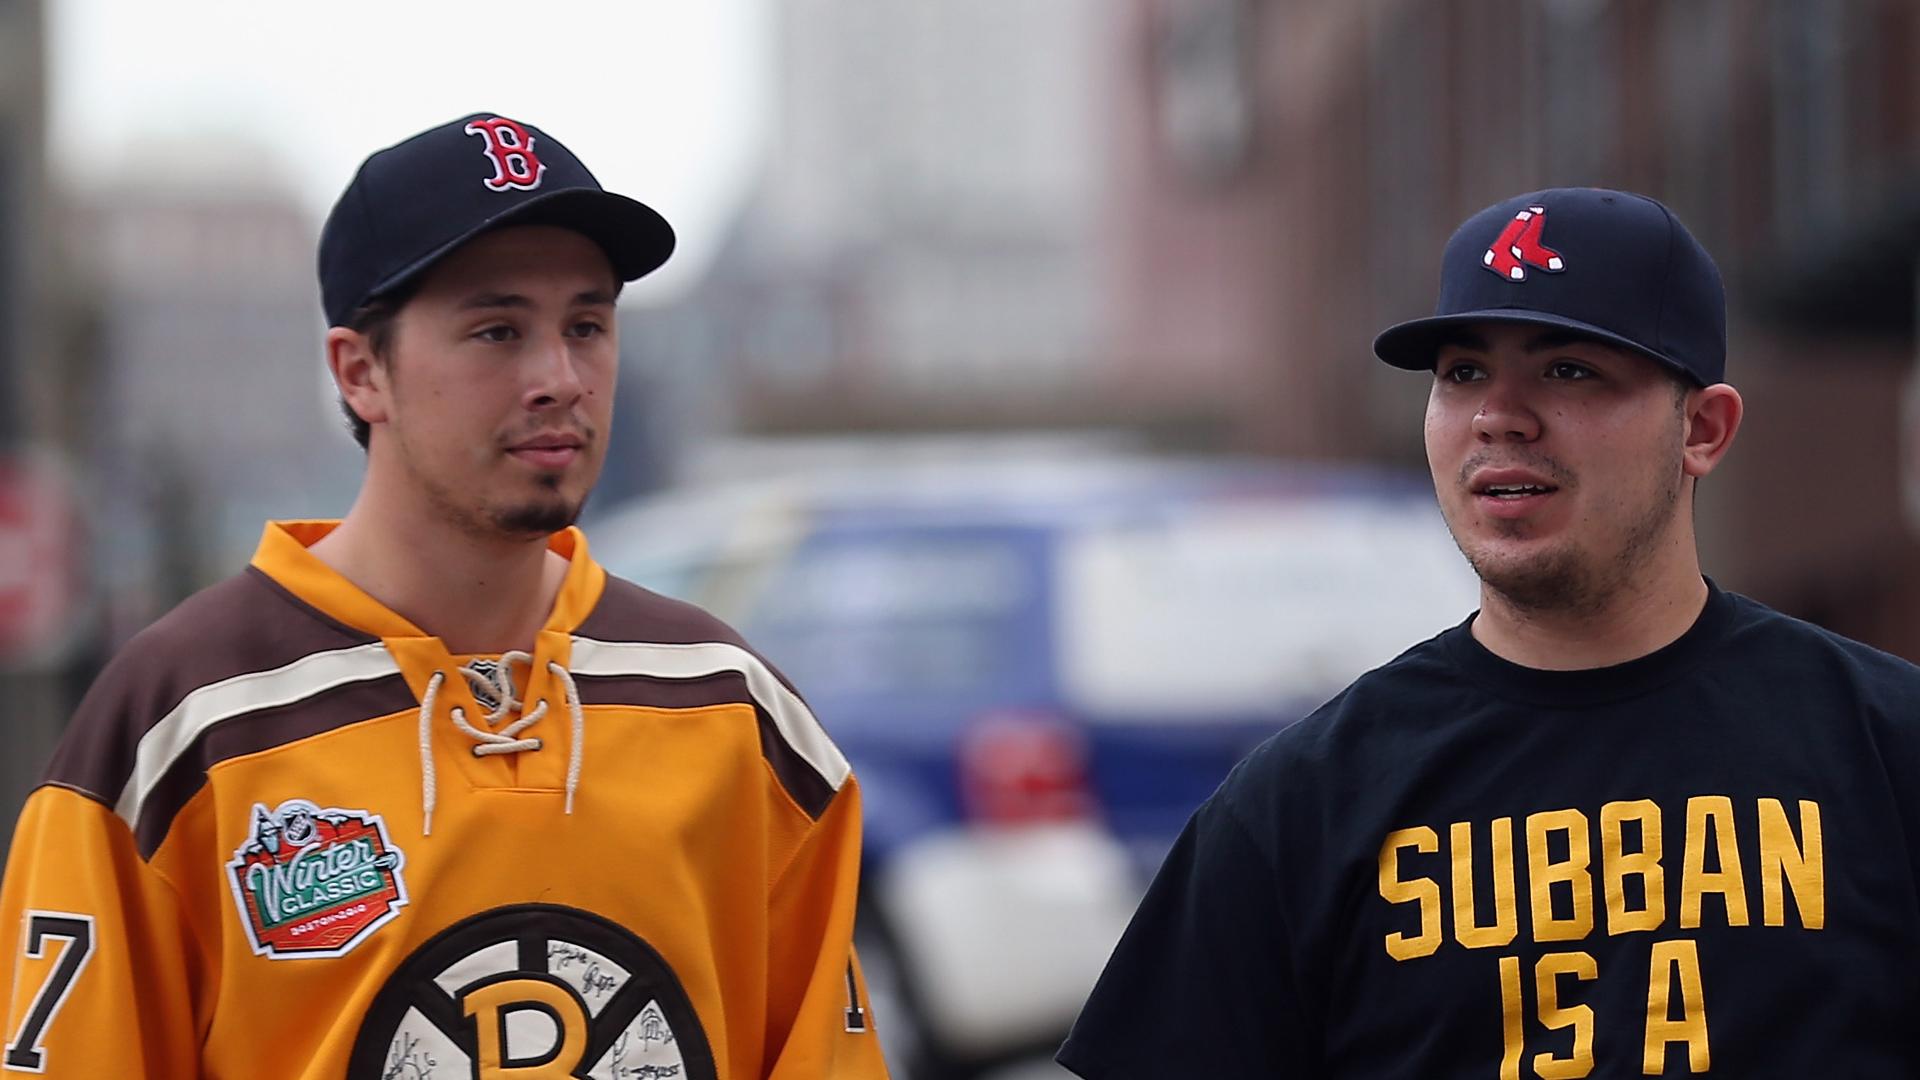 Bruins-Fans-090414-FTR-Getty.jpg